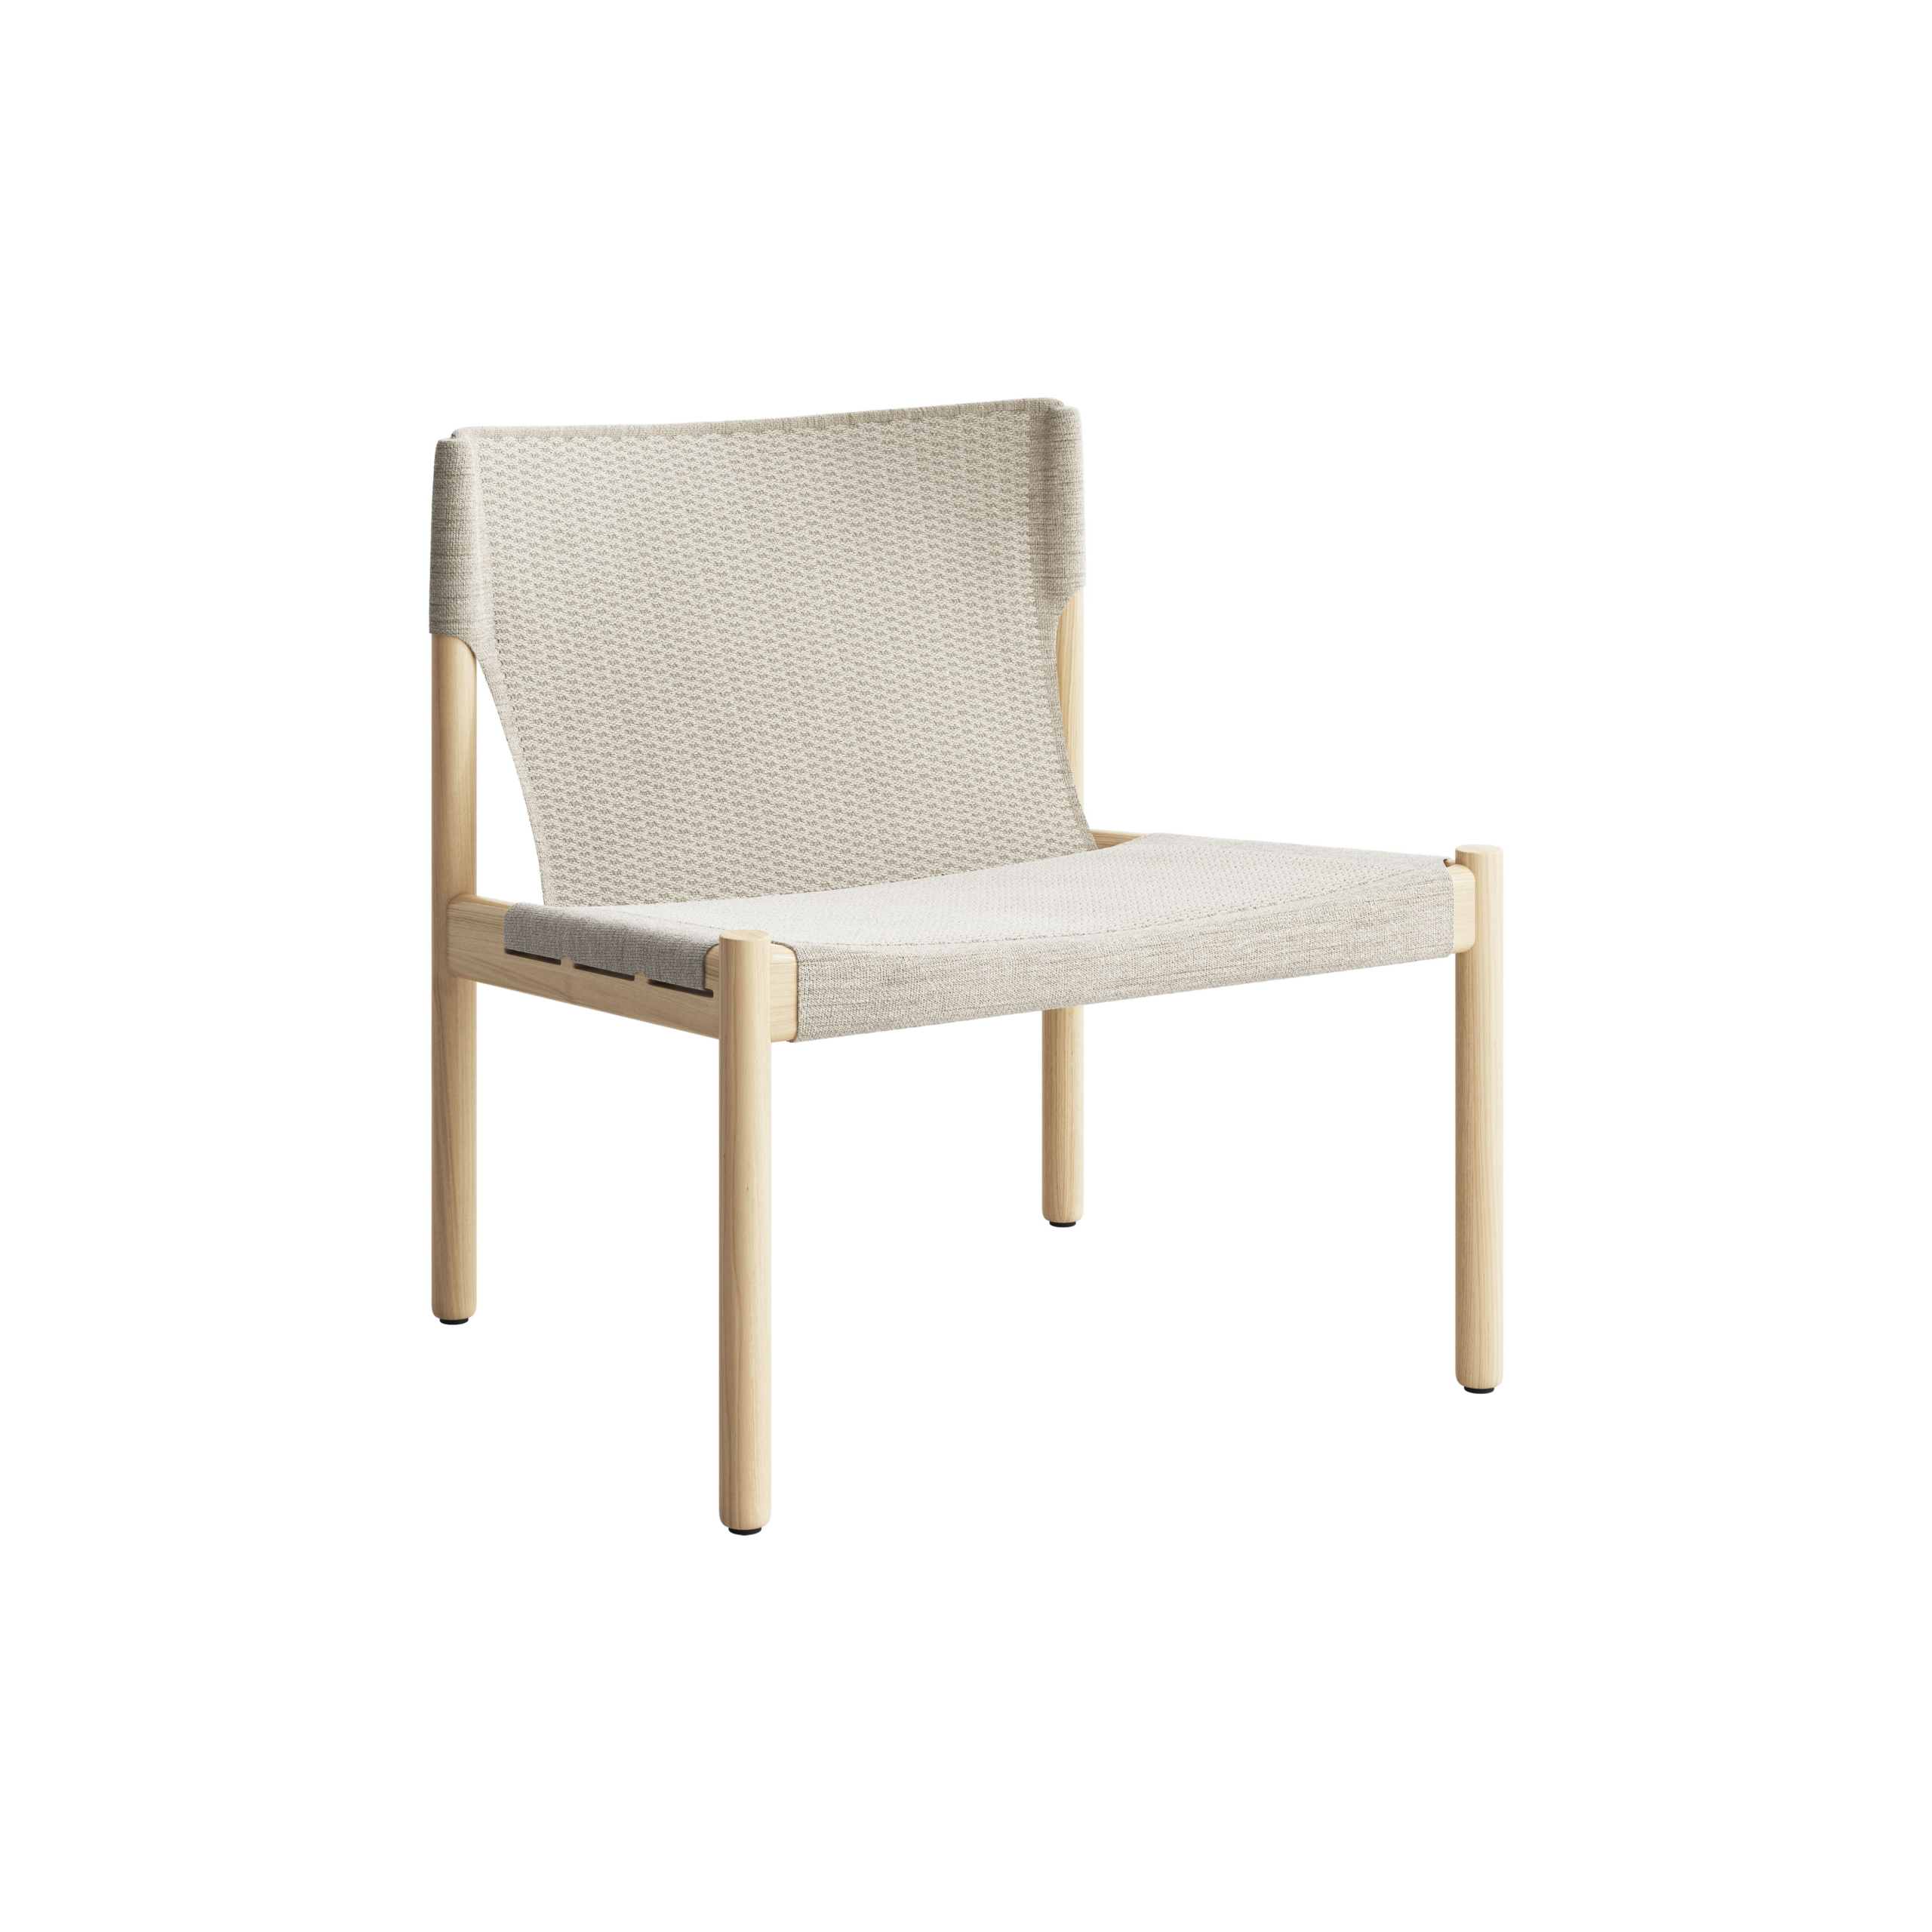 Evo Lounge chair product image 2